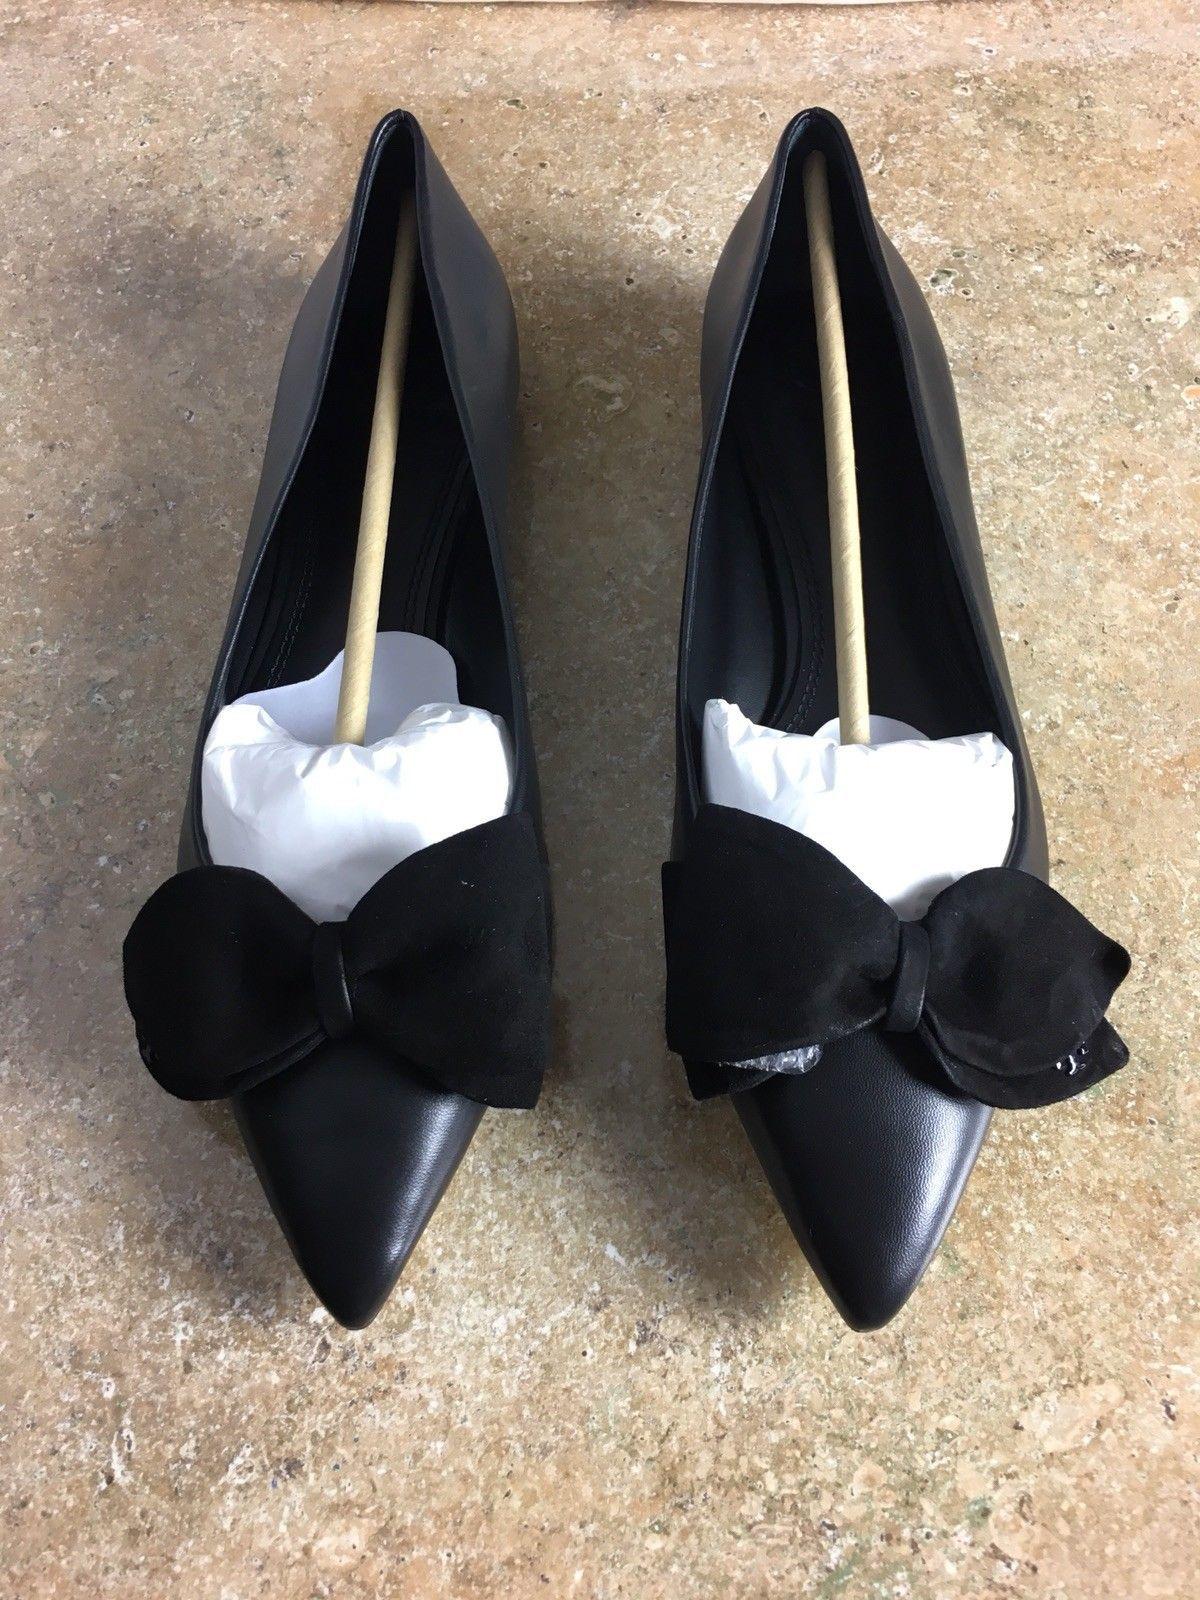 Tory Burch Rosalind Ballet Flat Black Leather Size 10